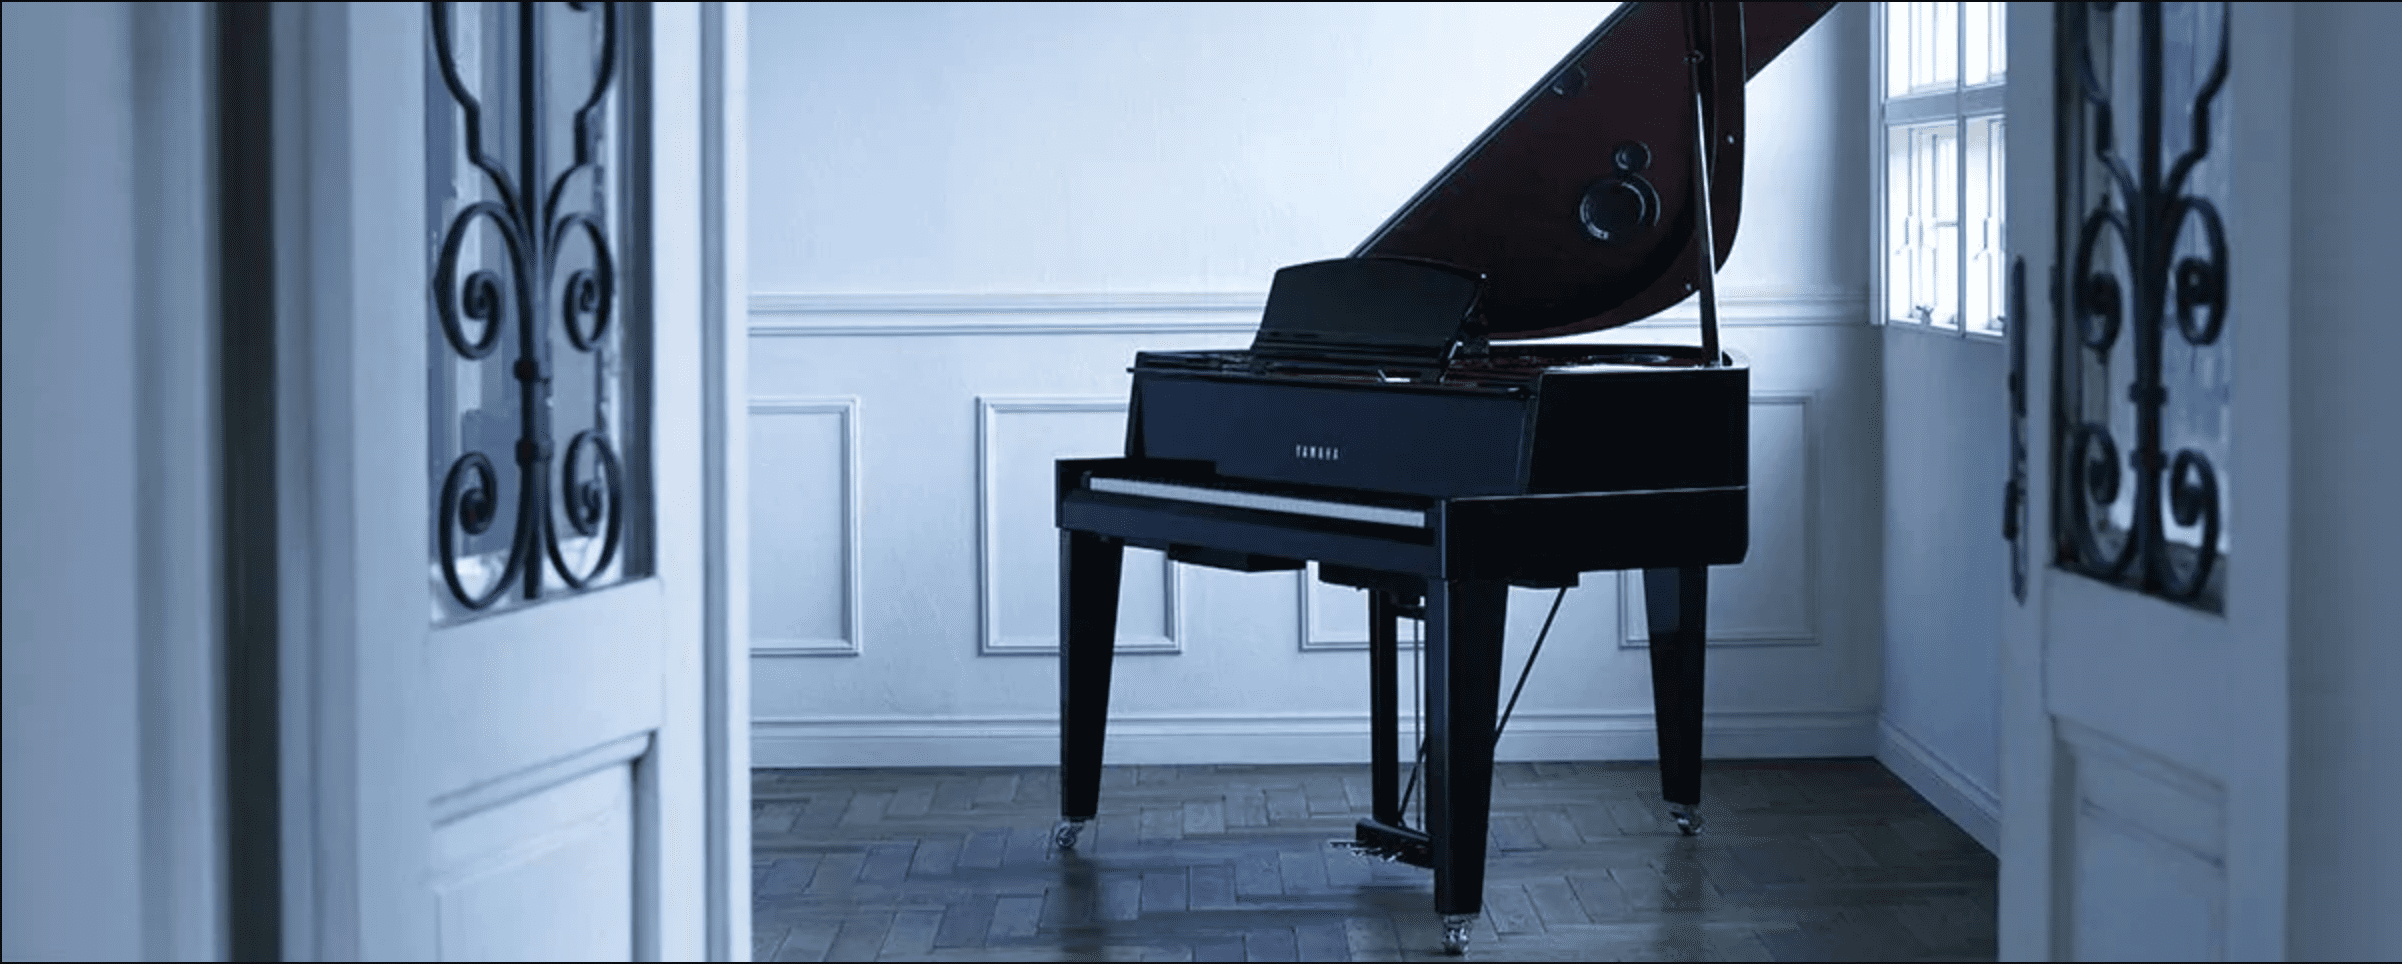 piano-dien-gia-co-yamaha-avantgrand-n3x-5